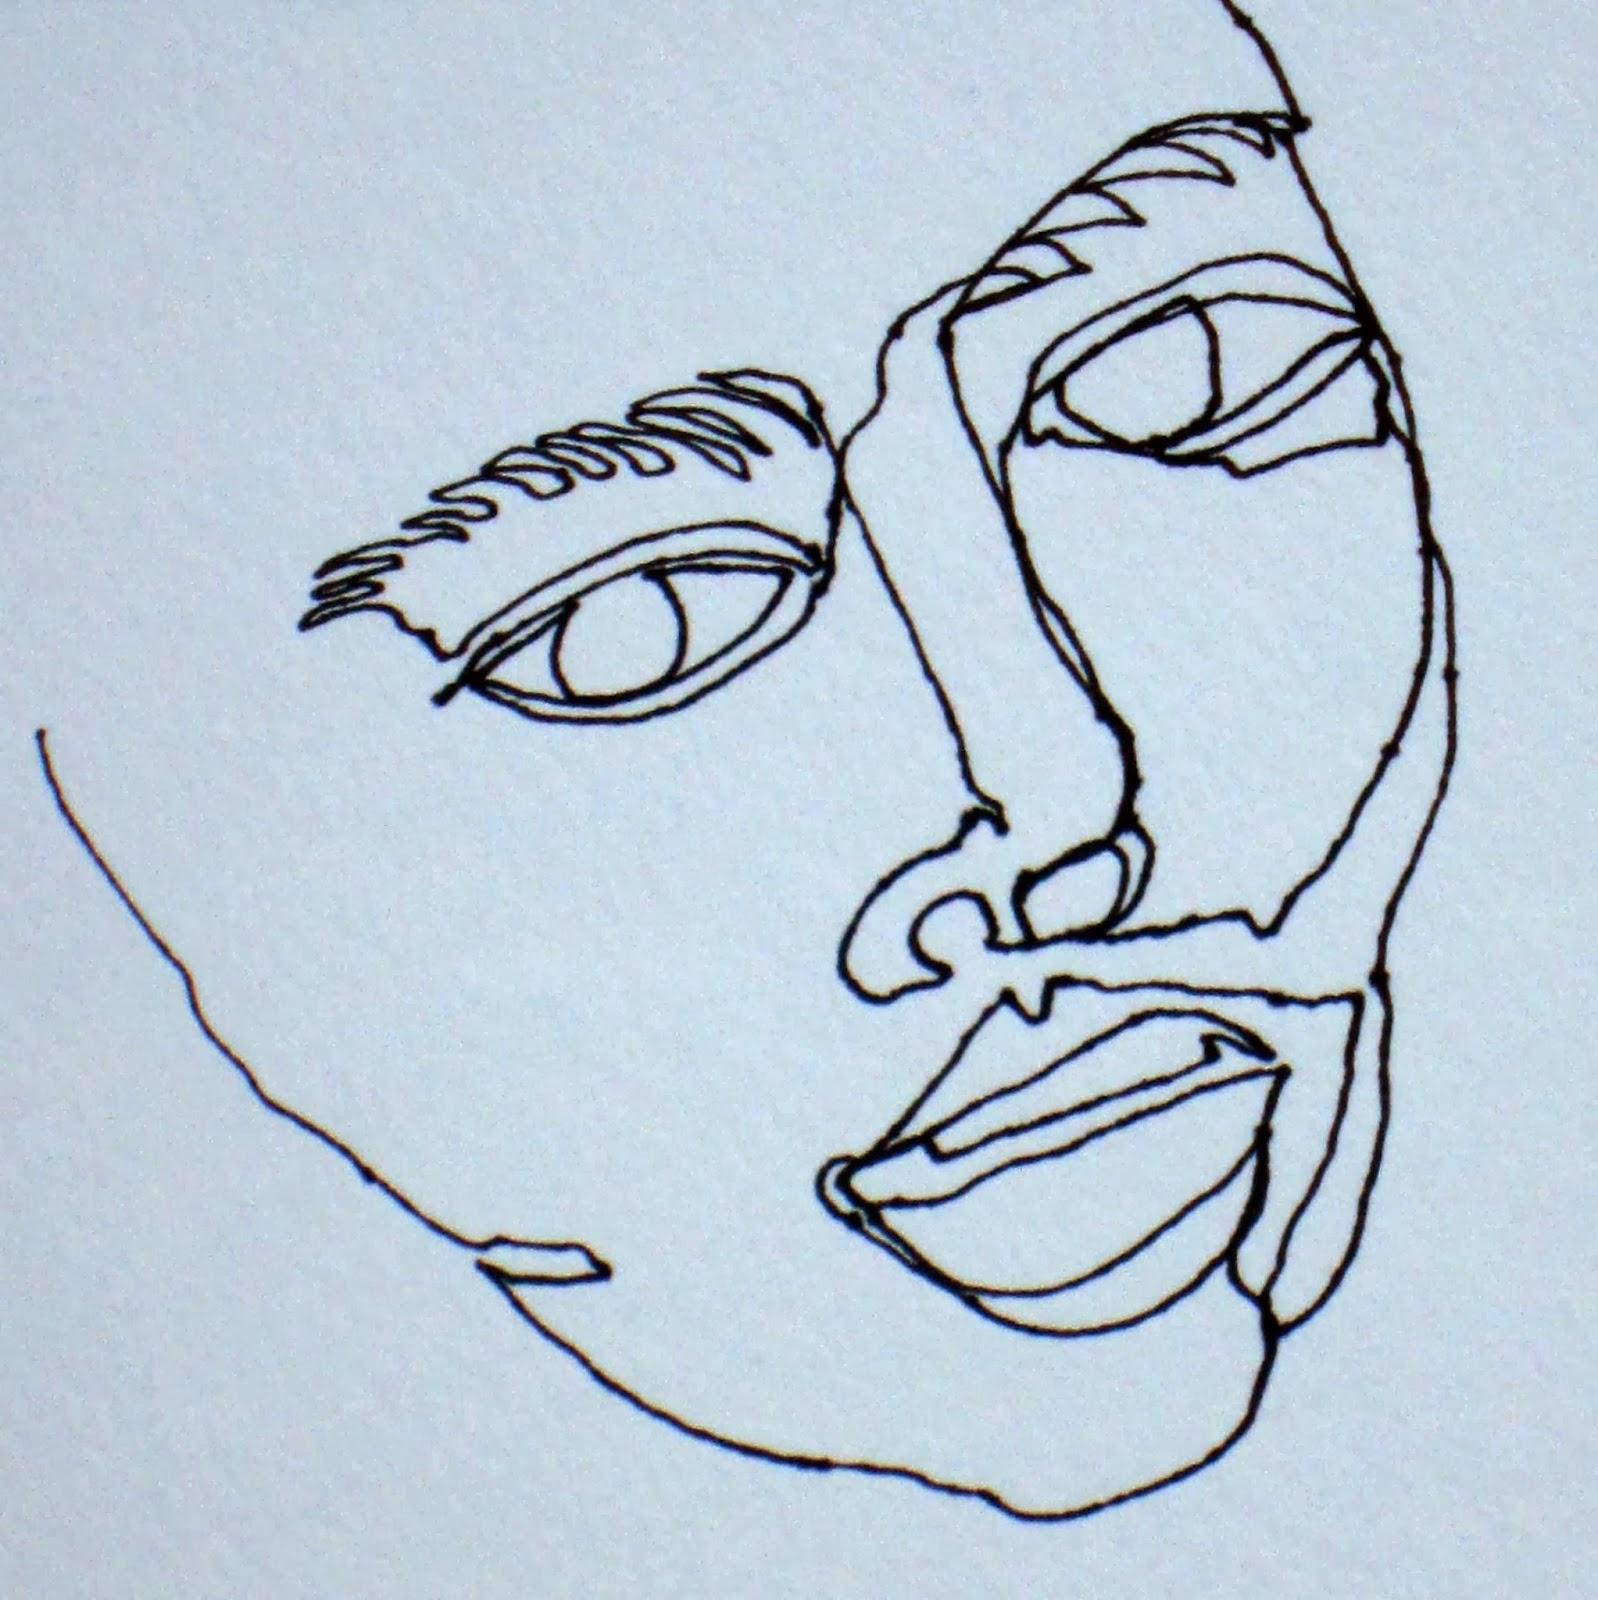 One Line Art Faces : Cindymichaudart continuous line drawing